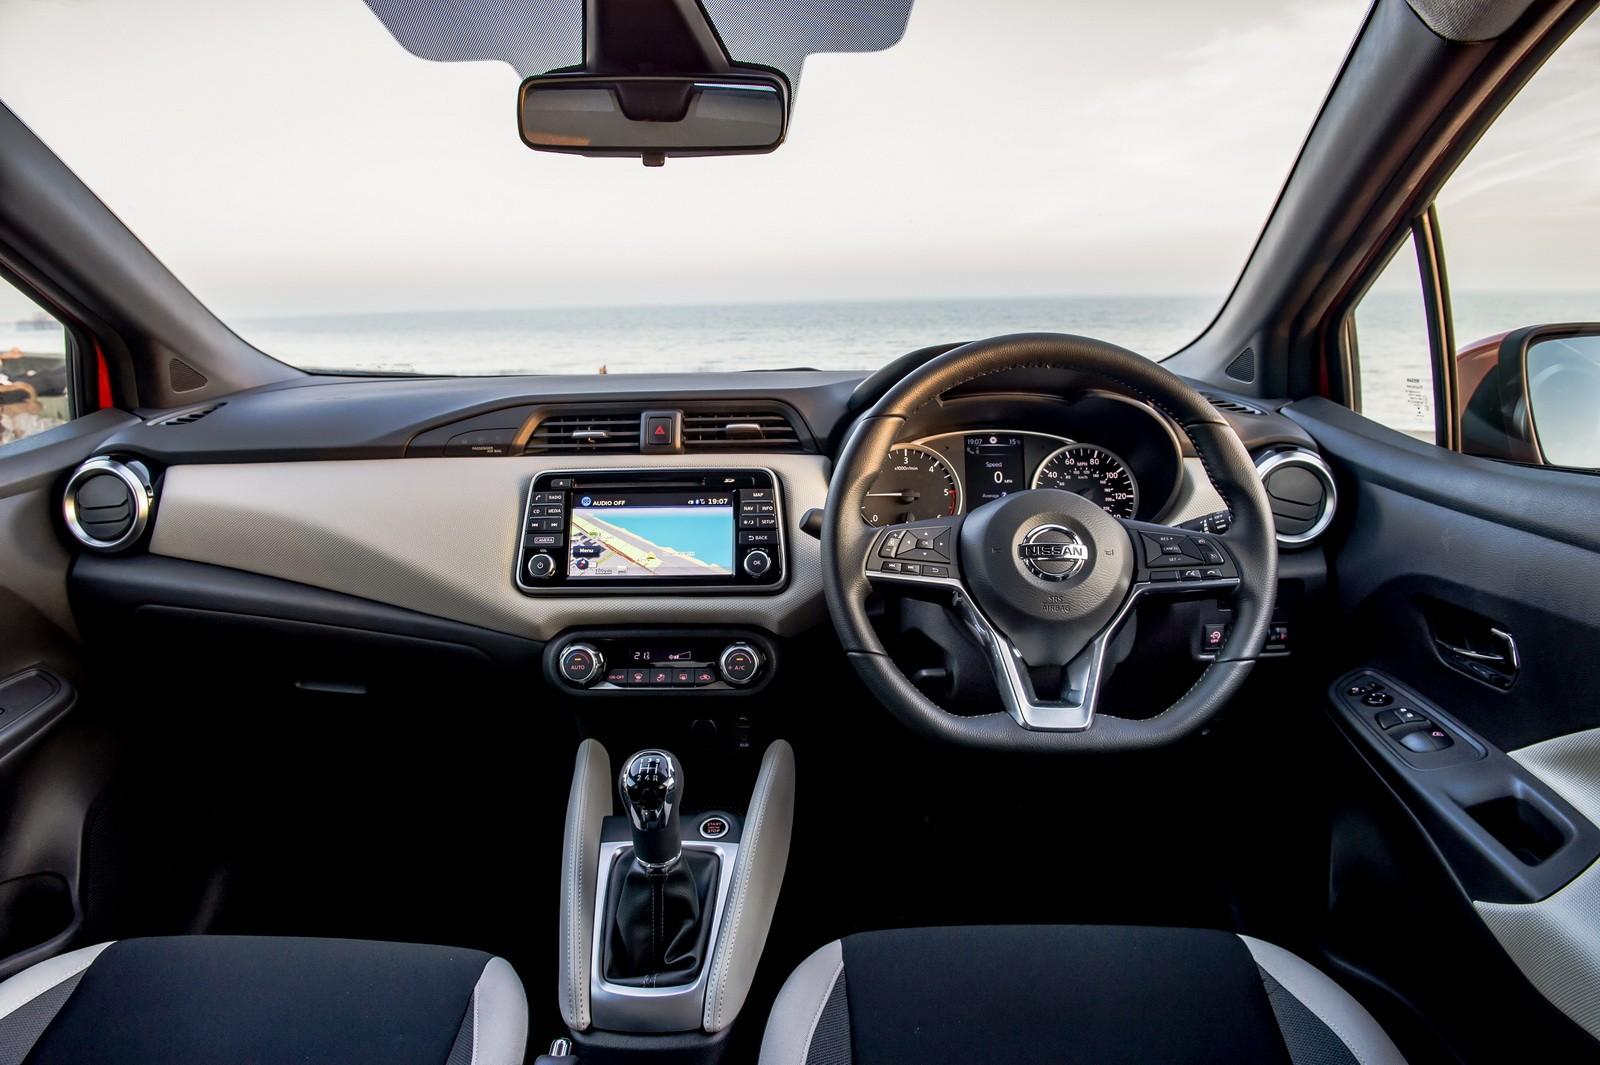 2017 Nissan Micra Gets Renault's 70 HP 1.0-Liter Engine ...